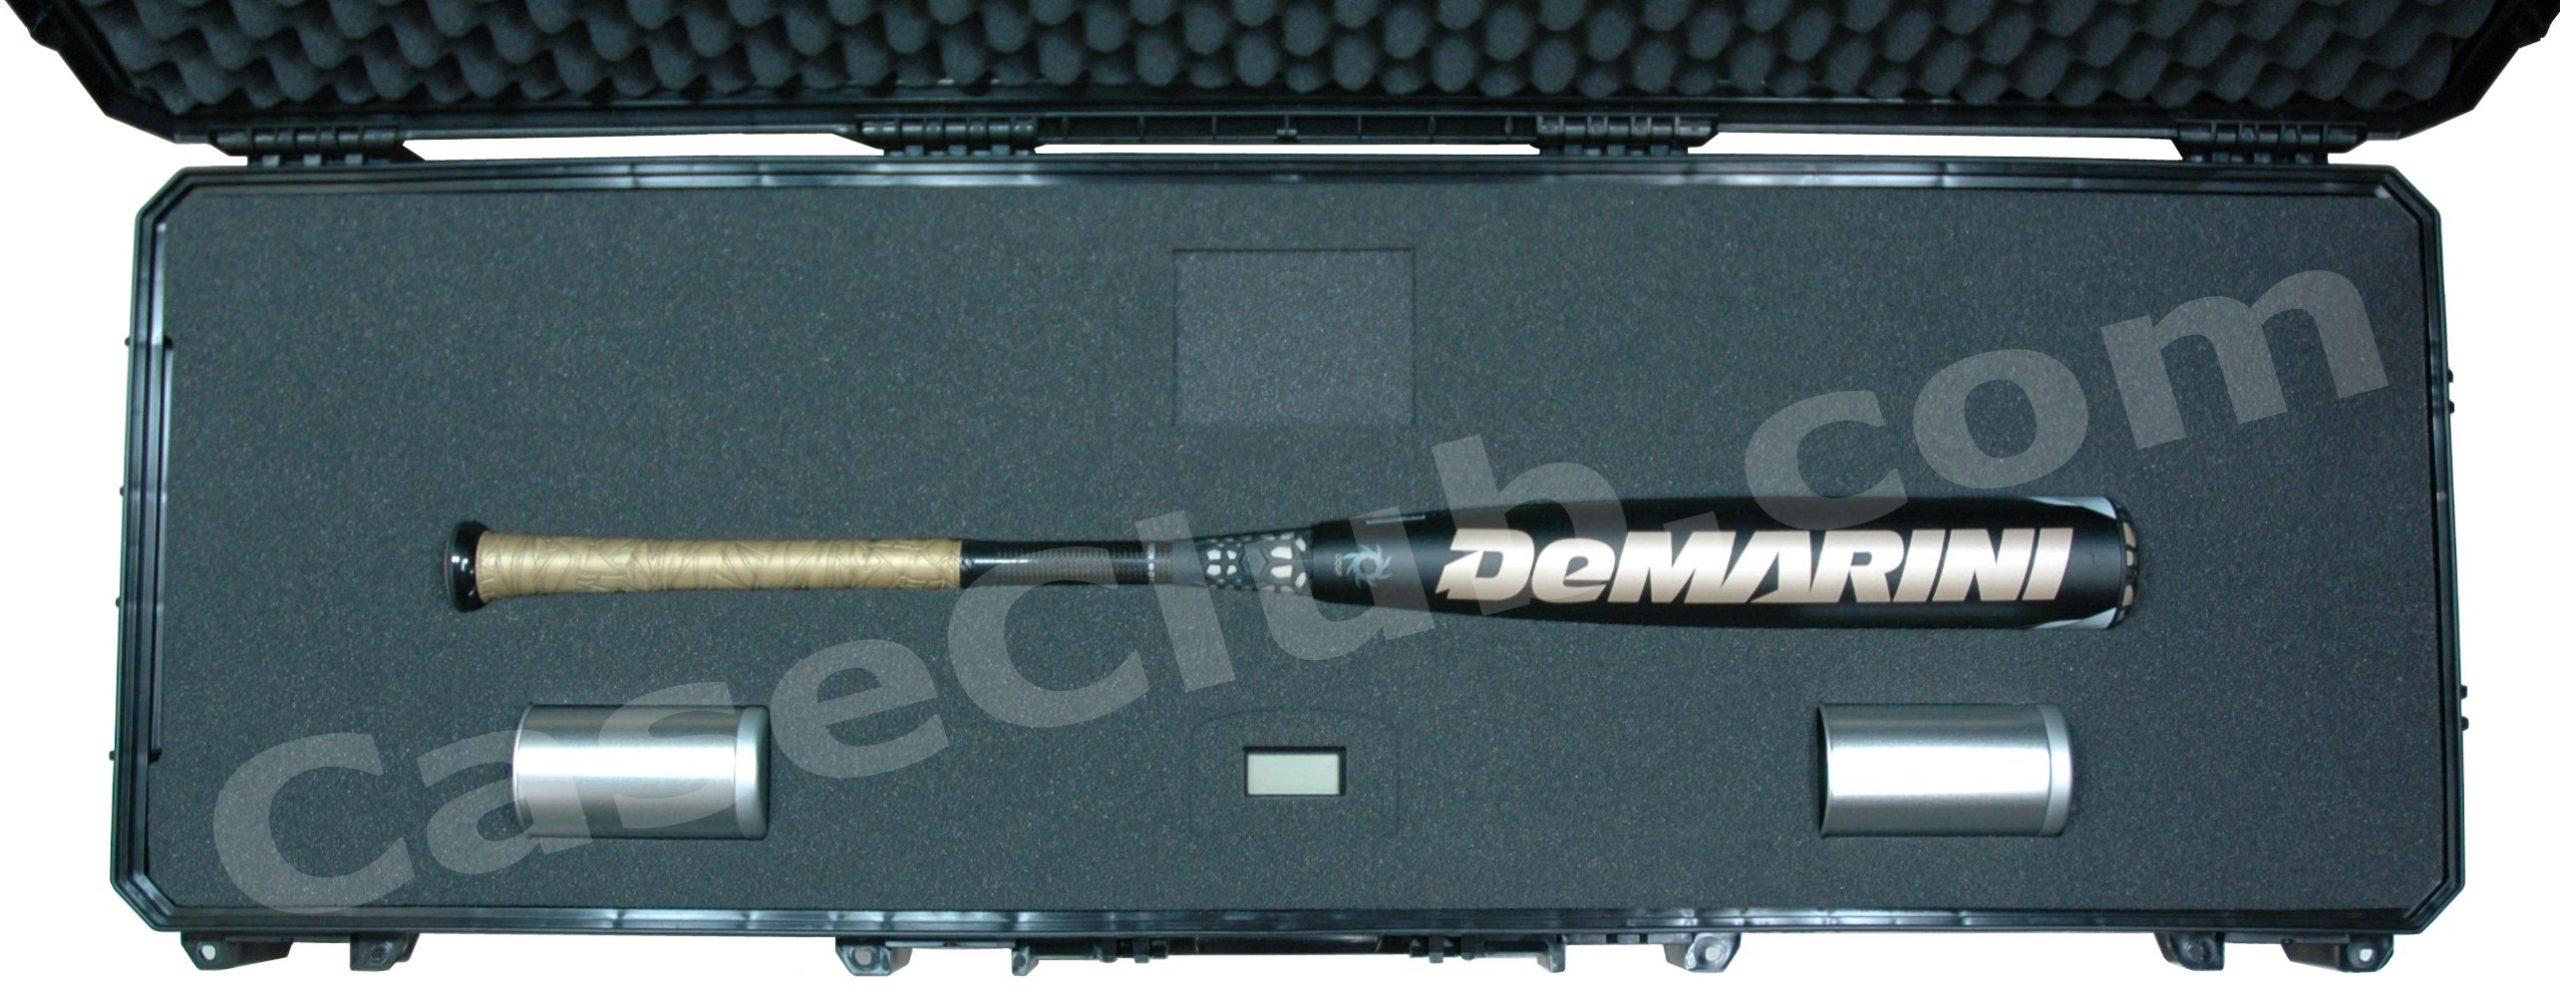 Case Club CC1530SE Case Custom Foam Example: Demarini Voodoo Overlord BBCOR Baseball Bat Case